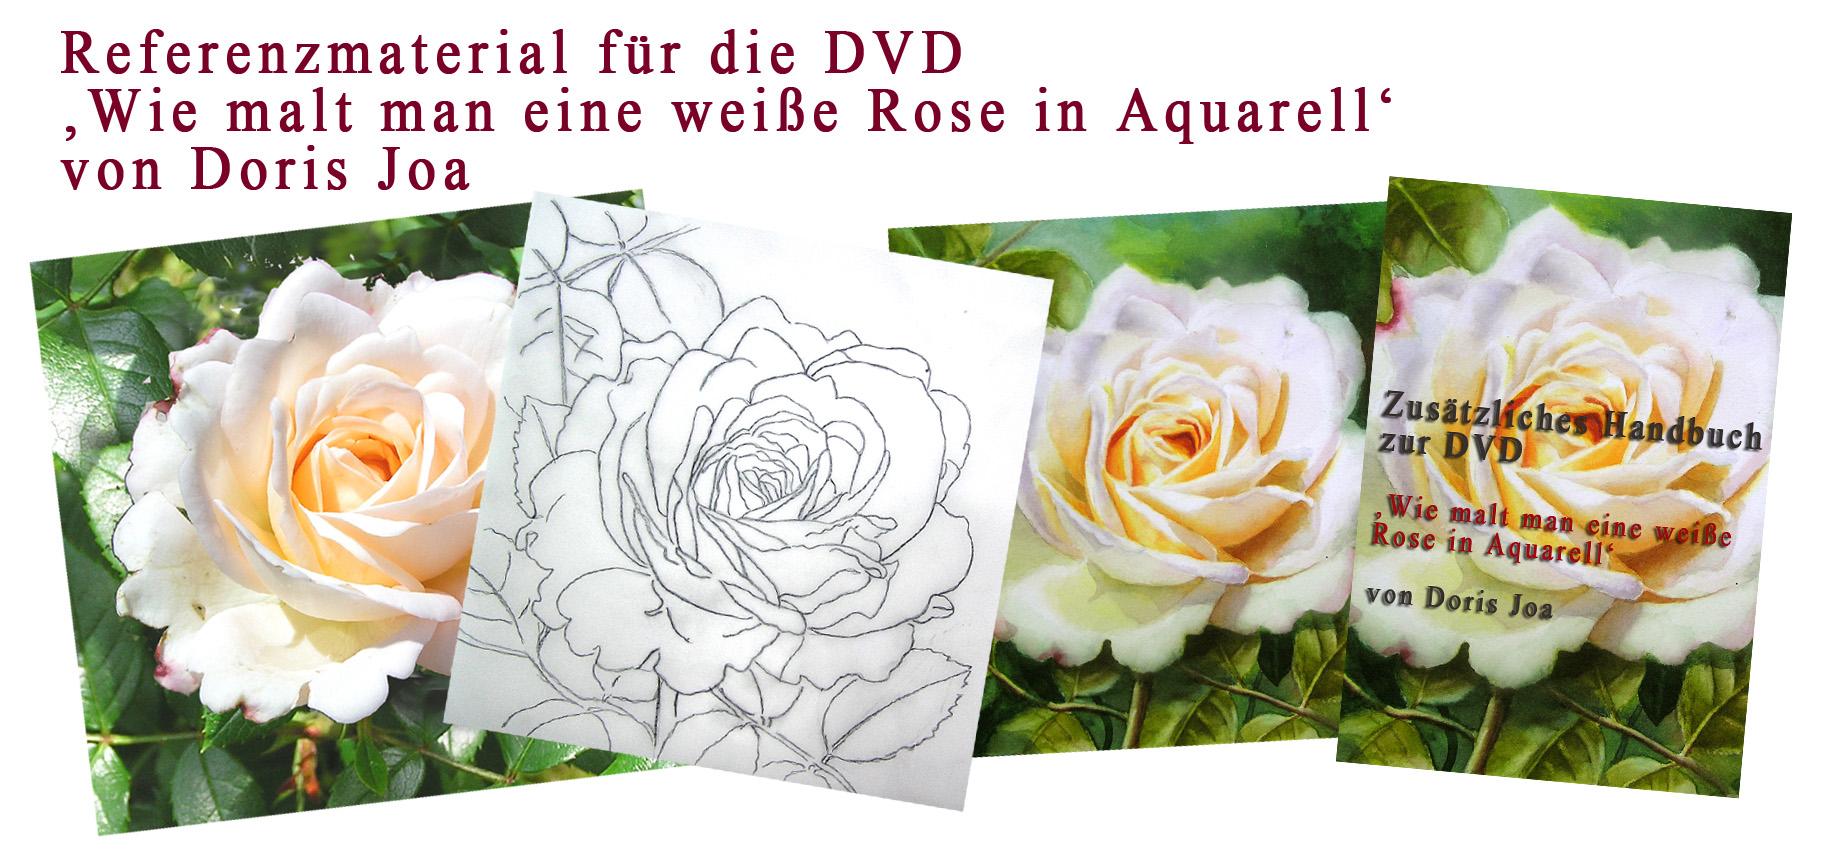 banner dvd-1-deutsch Kopie